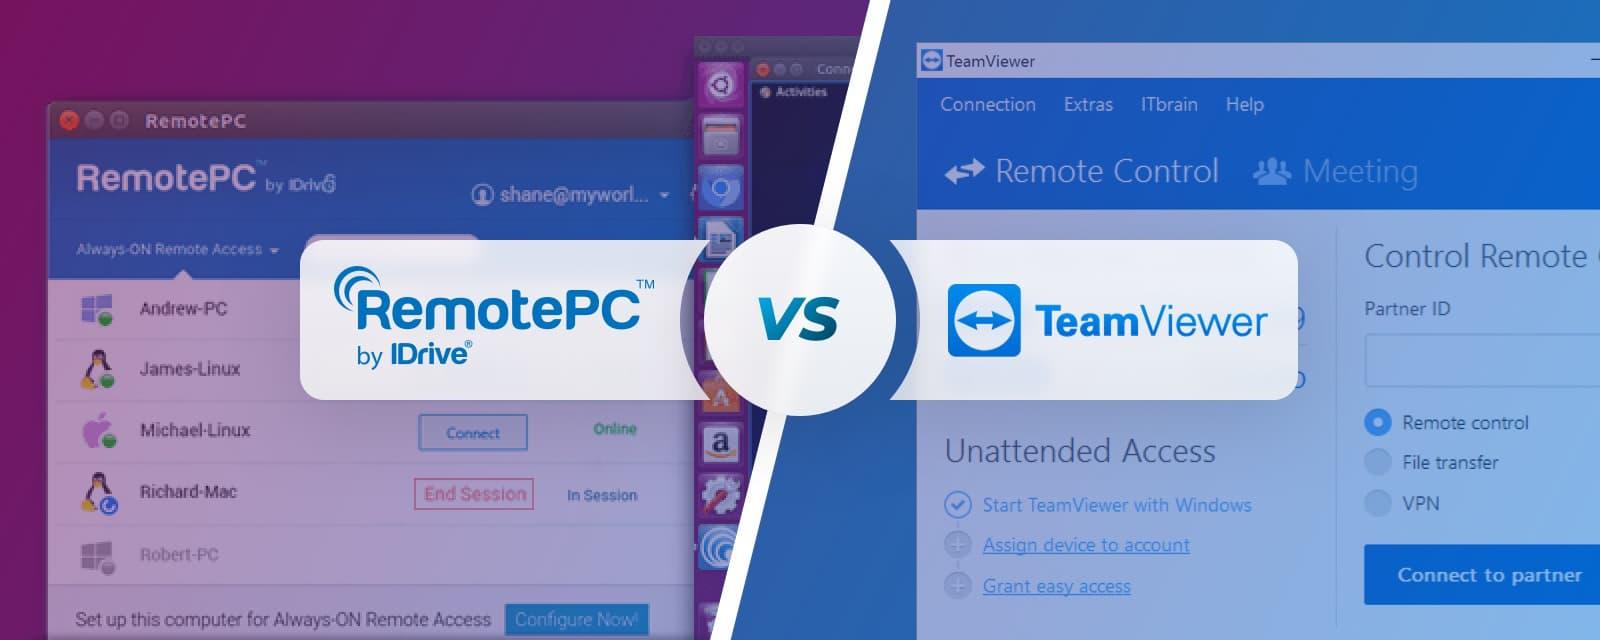 teamviewer vs remotepc